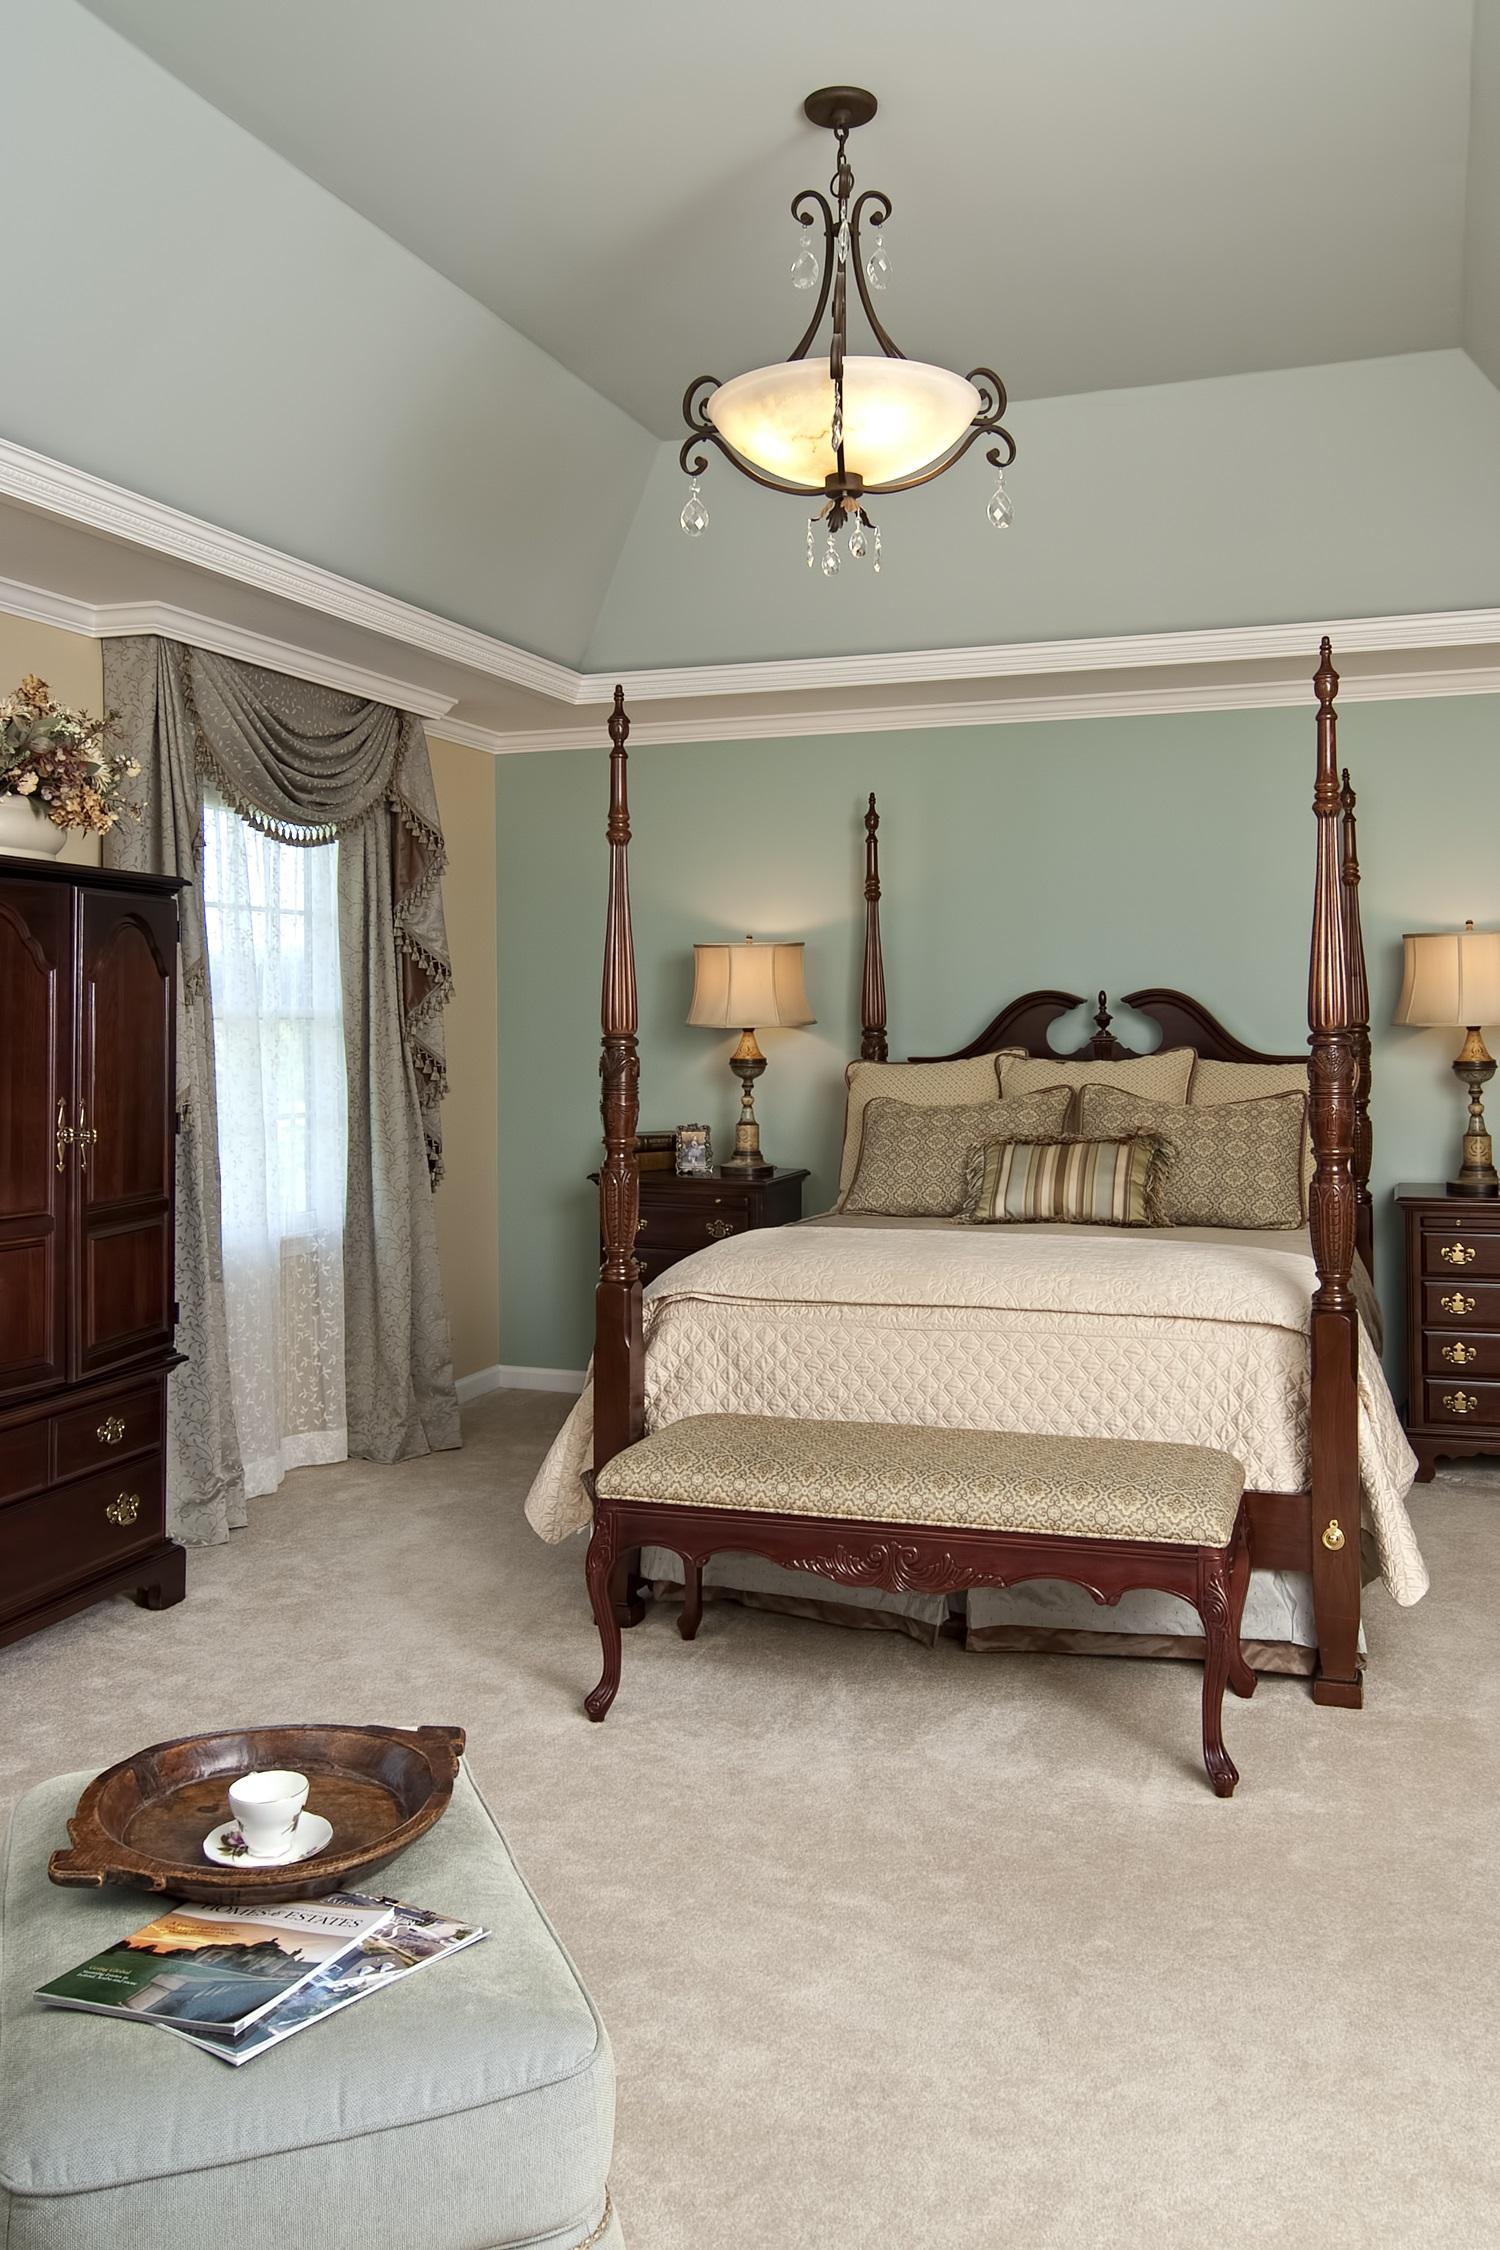 Bailiwick Interior Design - Molding Details - Tray Ceiling Master Bedroom - Accent Walls.jpg